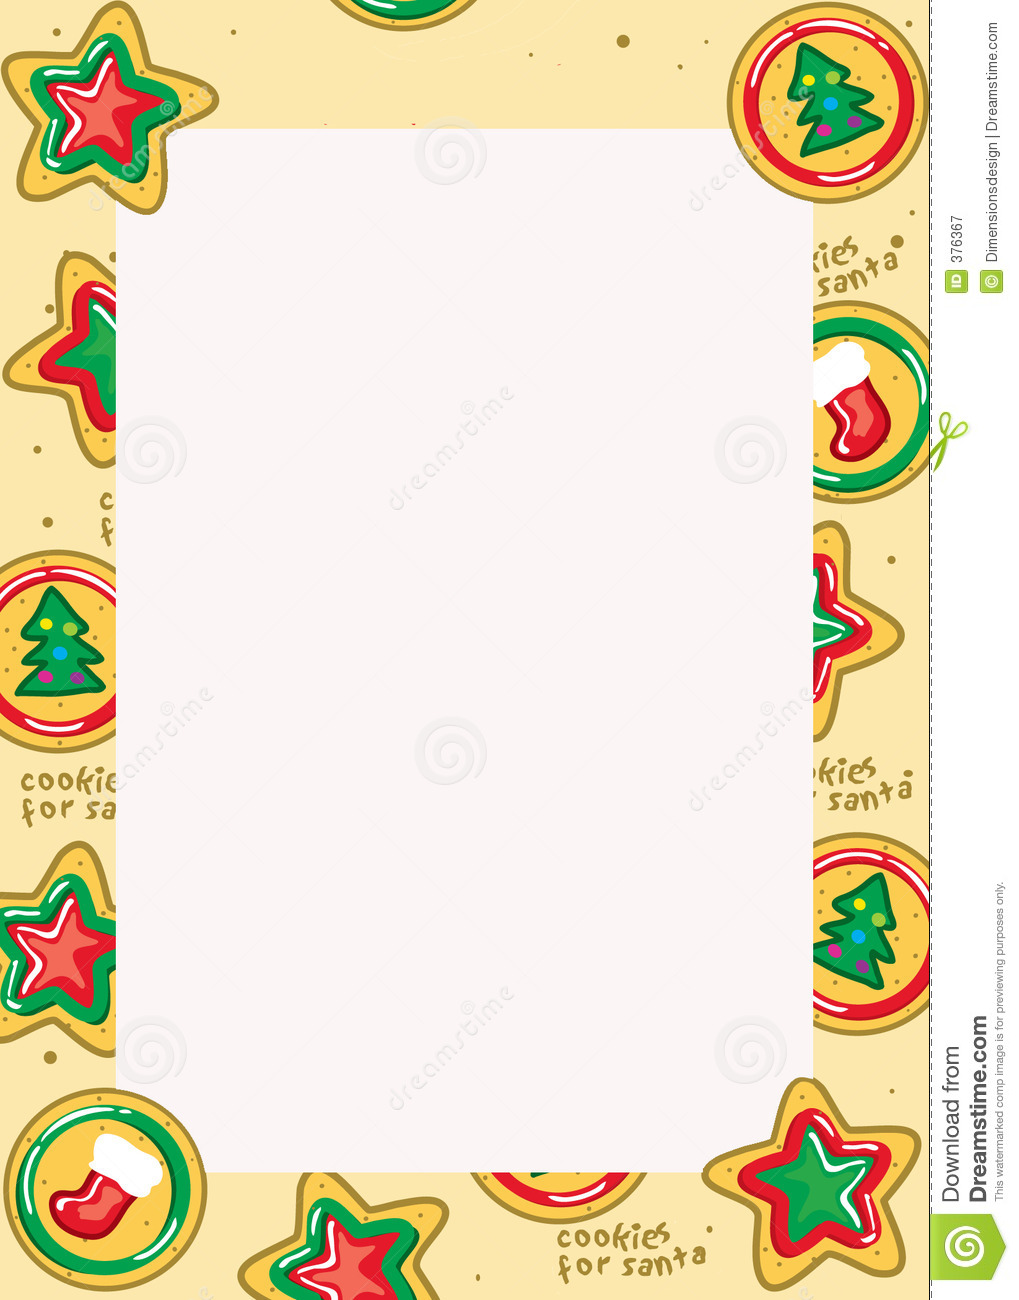 free christmas cookie borders clip art - photo #1